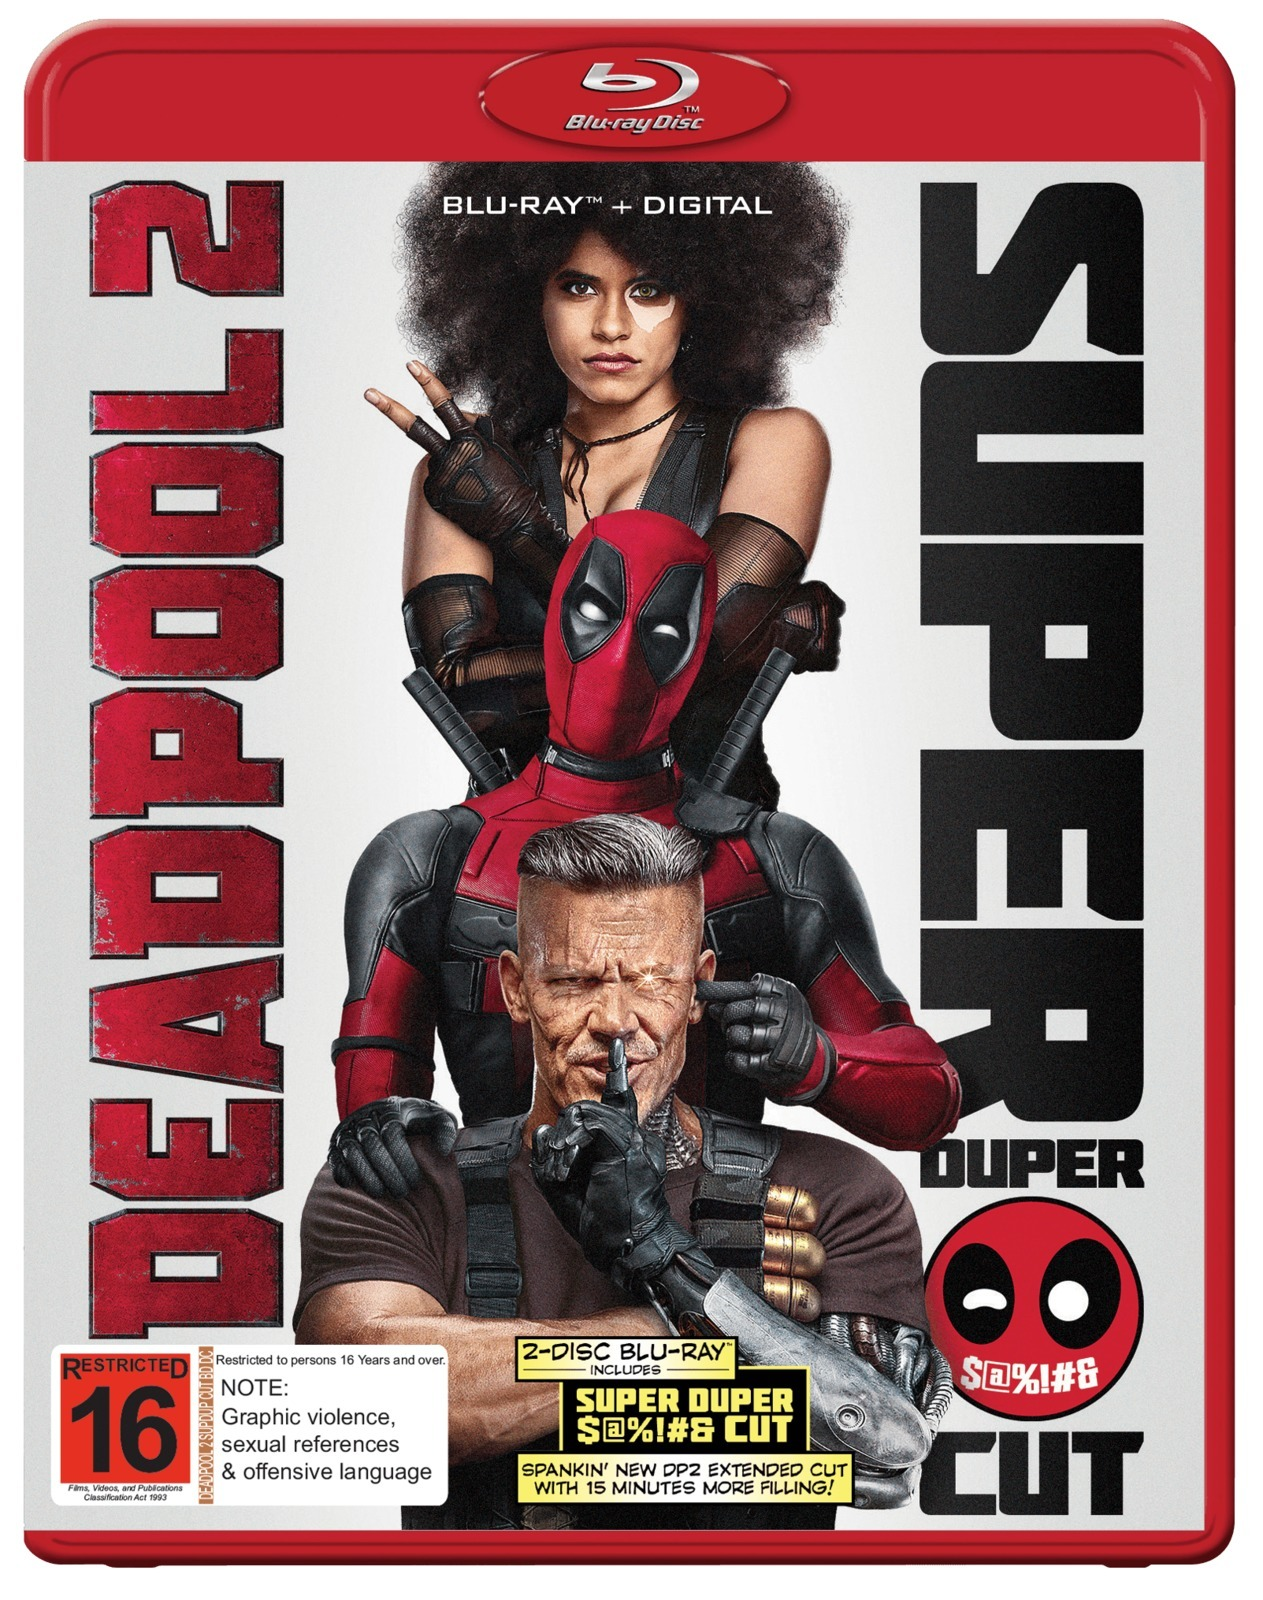 Deadpool 2 on Blu-ray, DC image